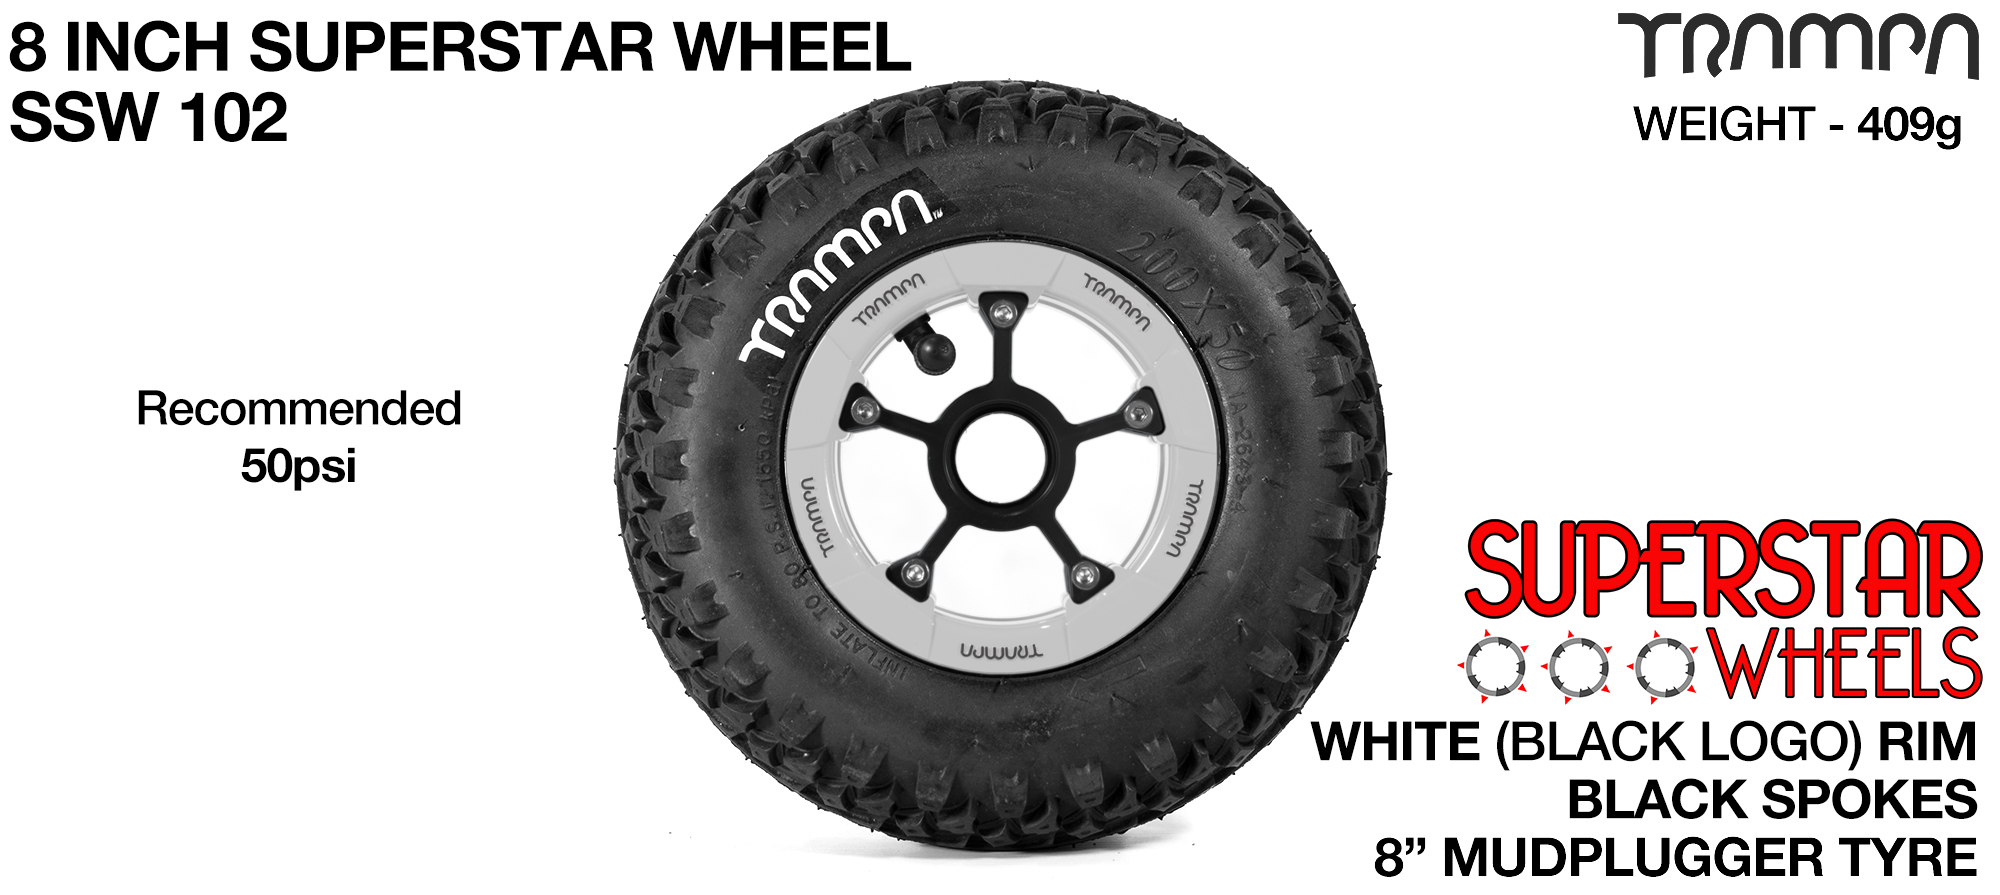 Superstar 8 inch wheels -  White Gloss Rim Black Anodised Spokes & Mud Plugger 8 Inch Tyre